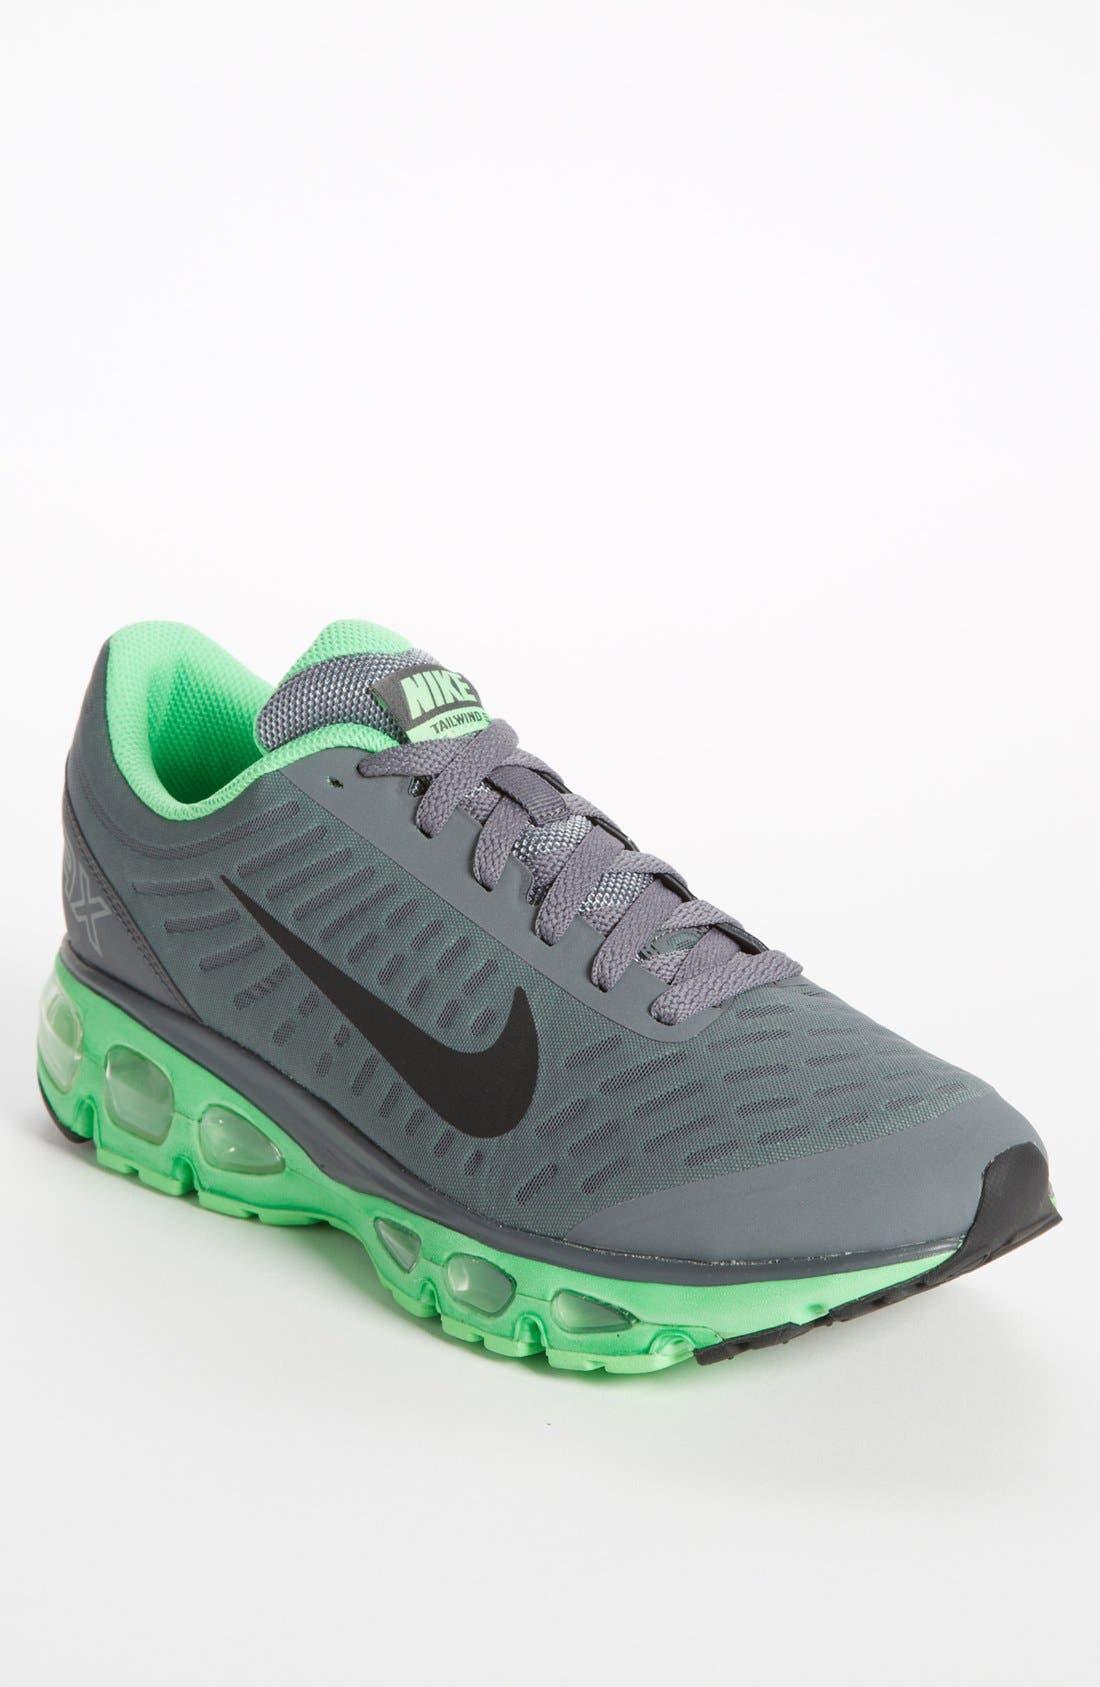 Main Image - Nike 'Air Max Tailwind+ 5' Running Shoe (Men)